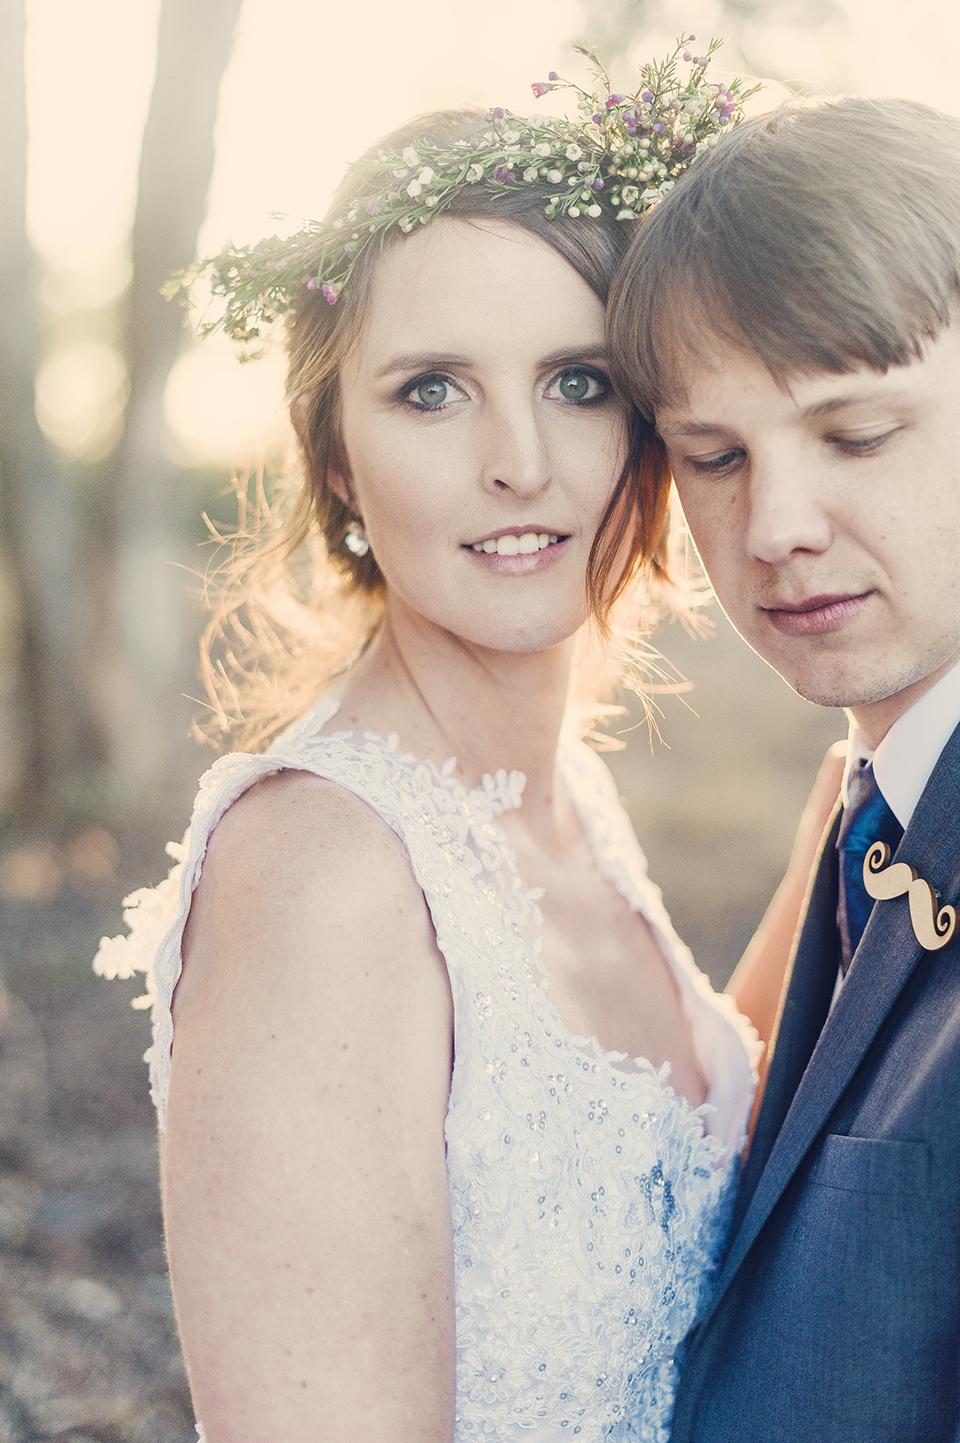 RyanParker_WeddingPhotographer_Pretoria_RosemaryHill_Gauteng_P&R_DSC_6947.jpg